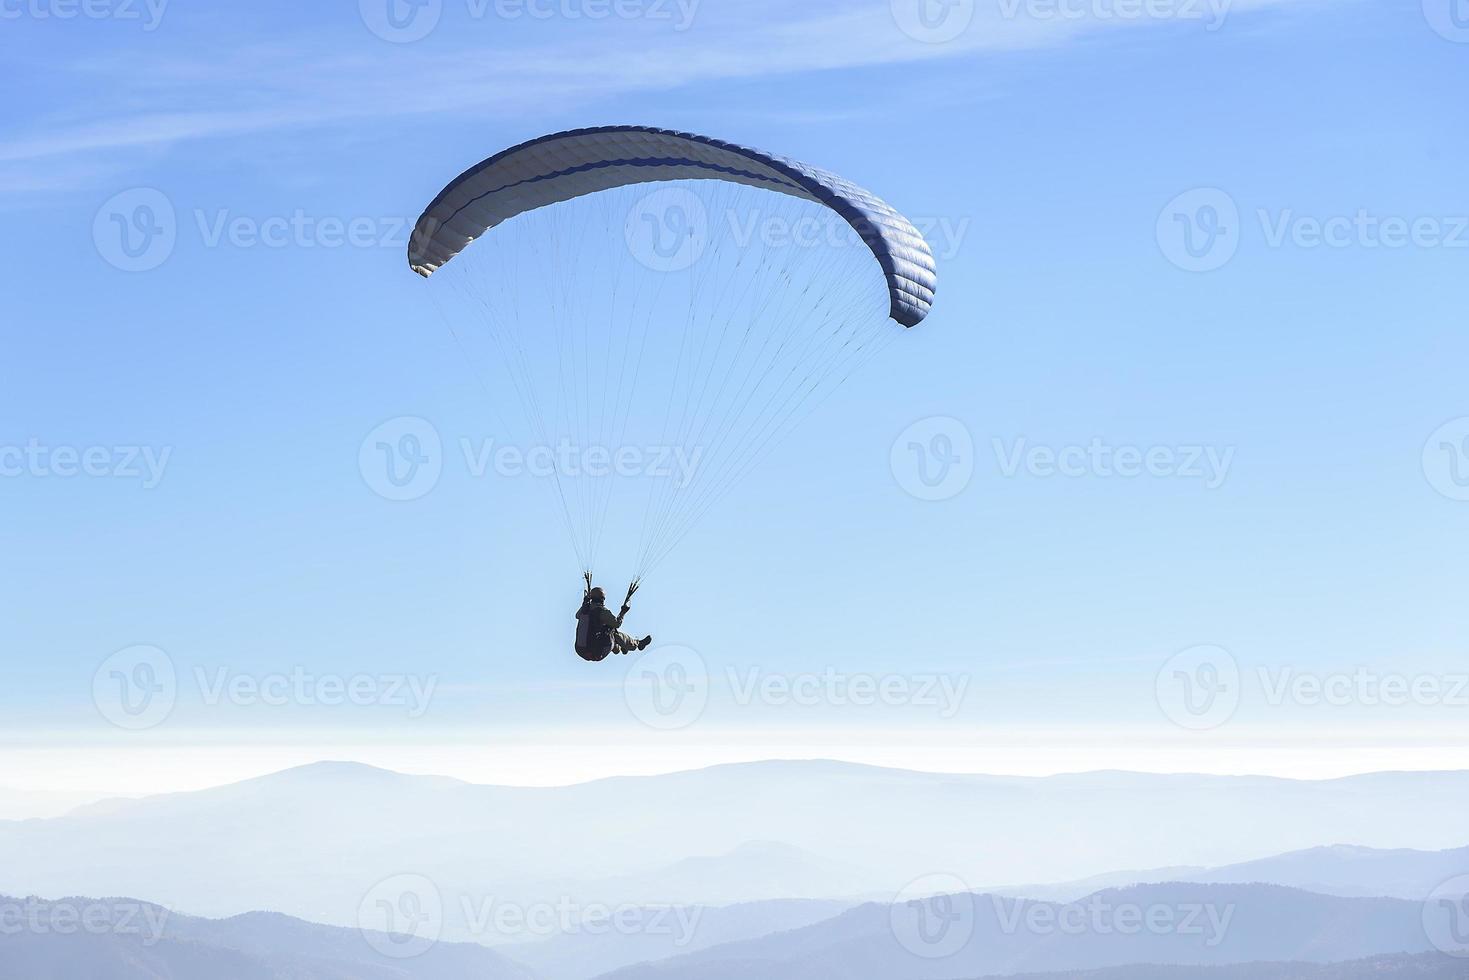 Gleitschirmfliegen am Himmel foto